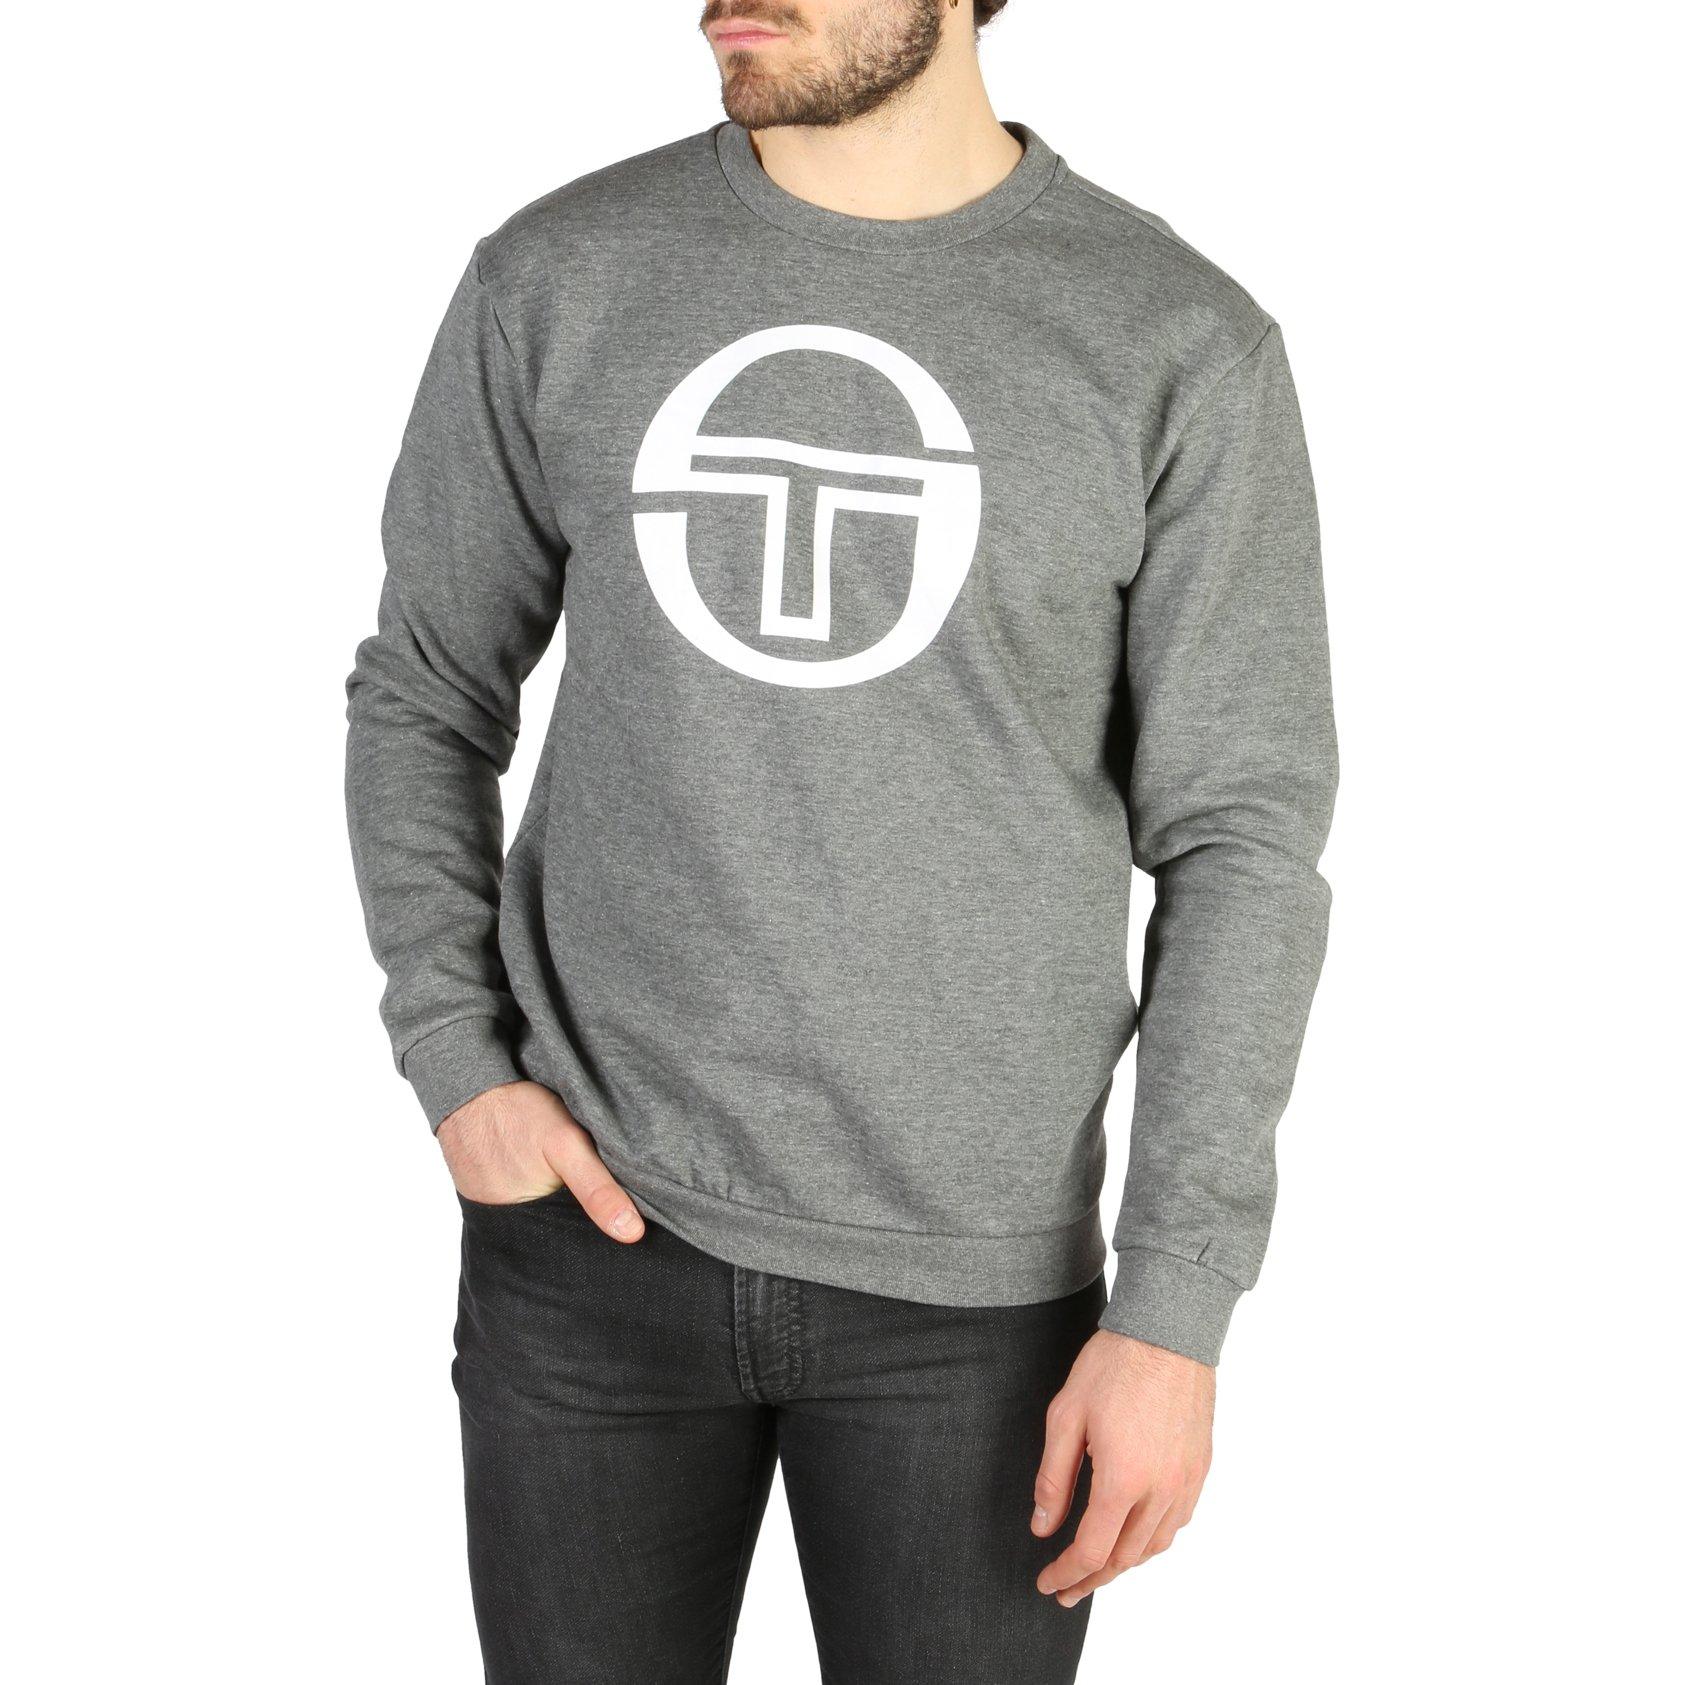 Sergio Tacchini Men's Sweatshirt Various Colours 103-10005 - grey S